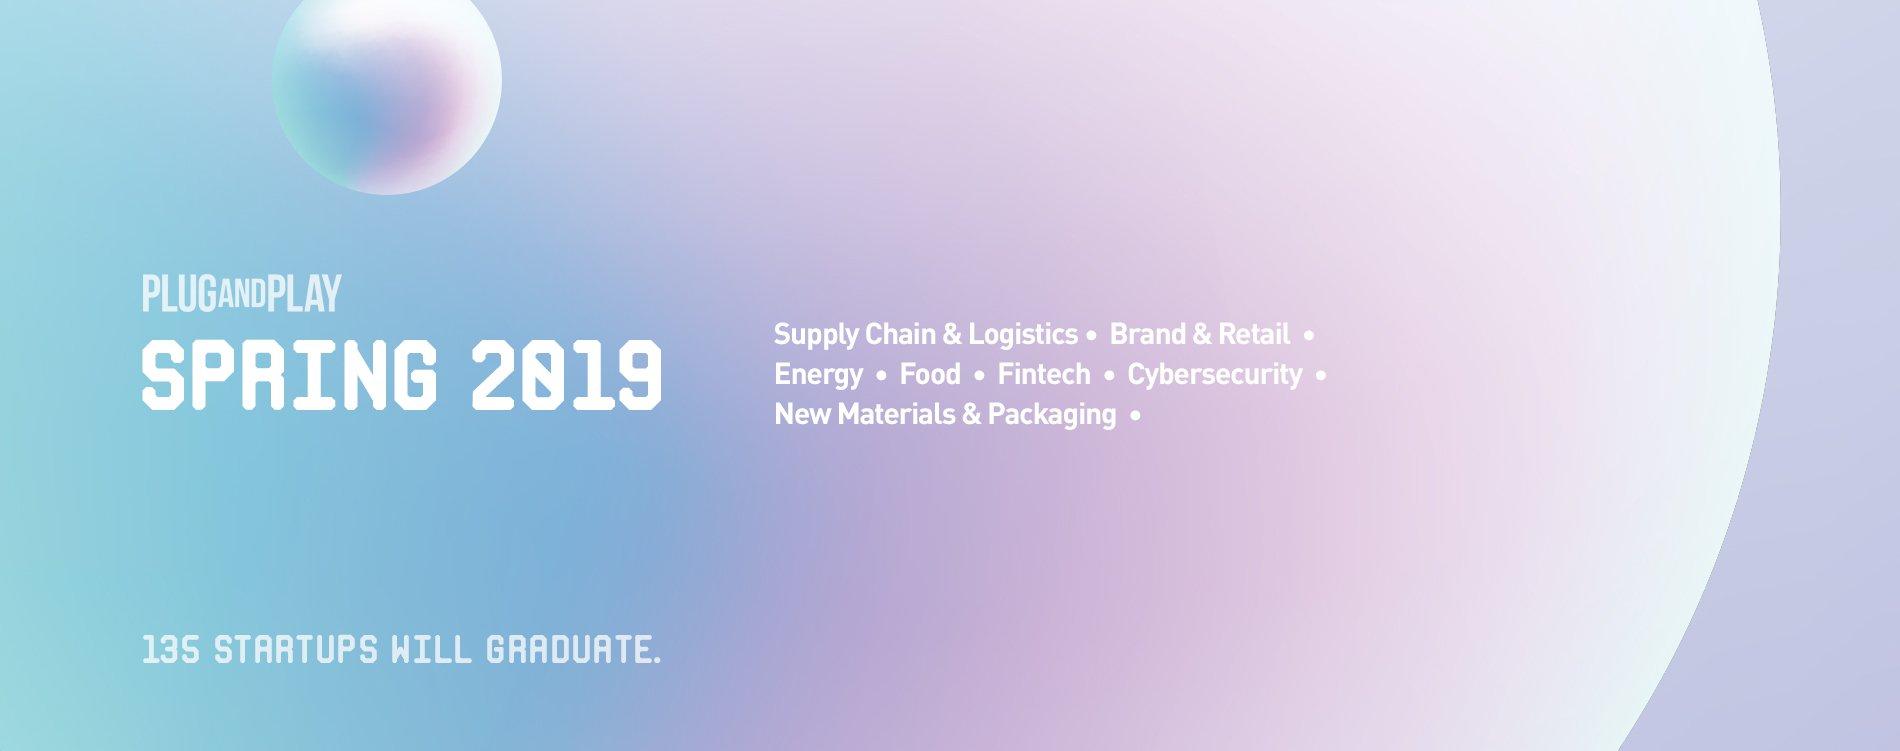 Spring Summit 2019 Startup Announcement